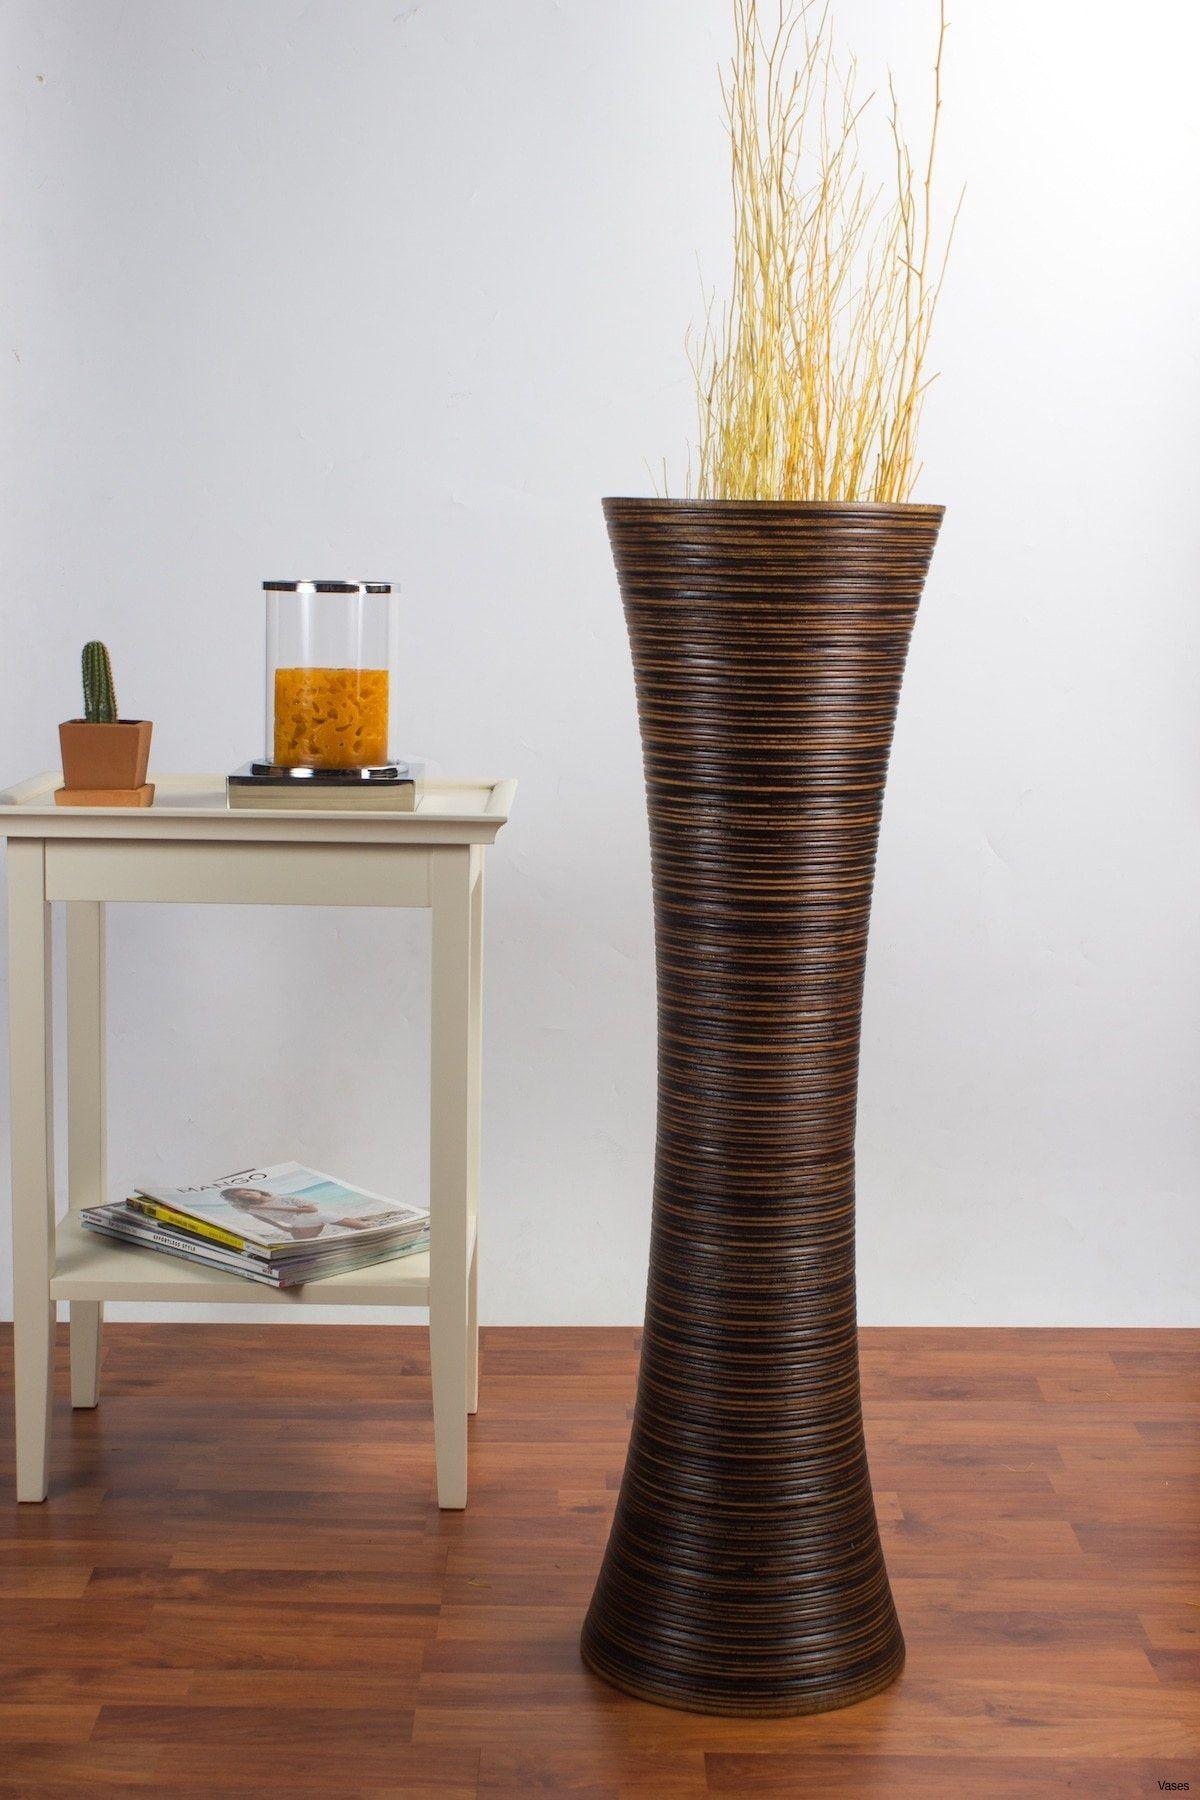 large ceramic vases and urns of tall decorative vases luxury decorative floor vases fresh d dkbrw pertaining to tall decorative vases luxury decorative floor vases fresh d dkbrw 5749 1h vases tall brown i